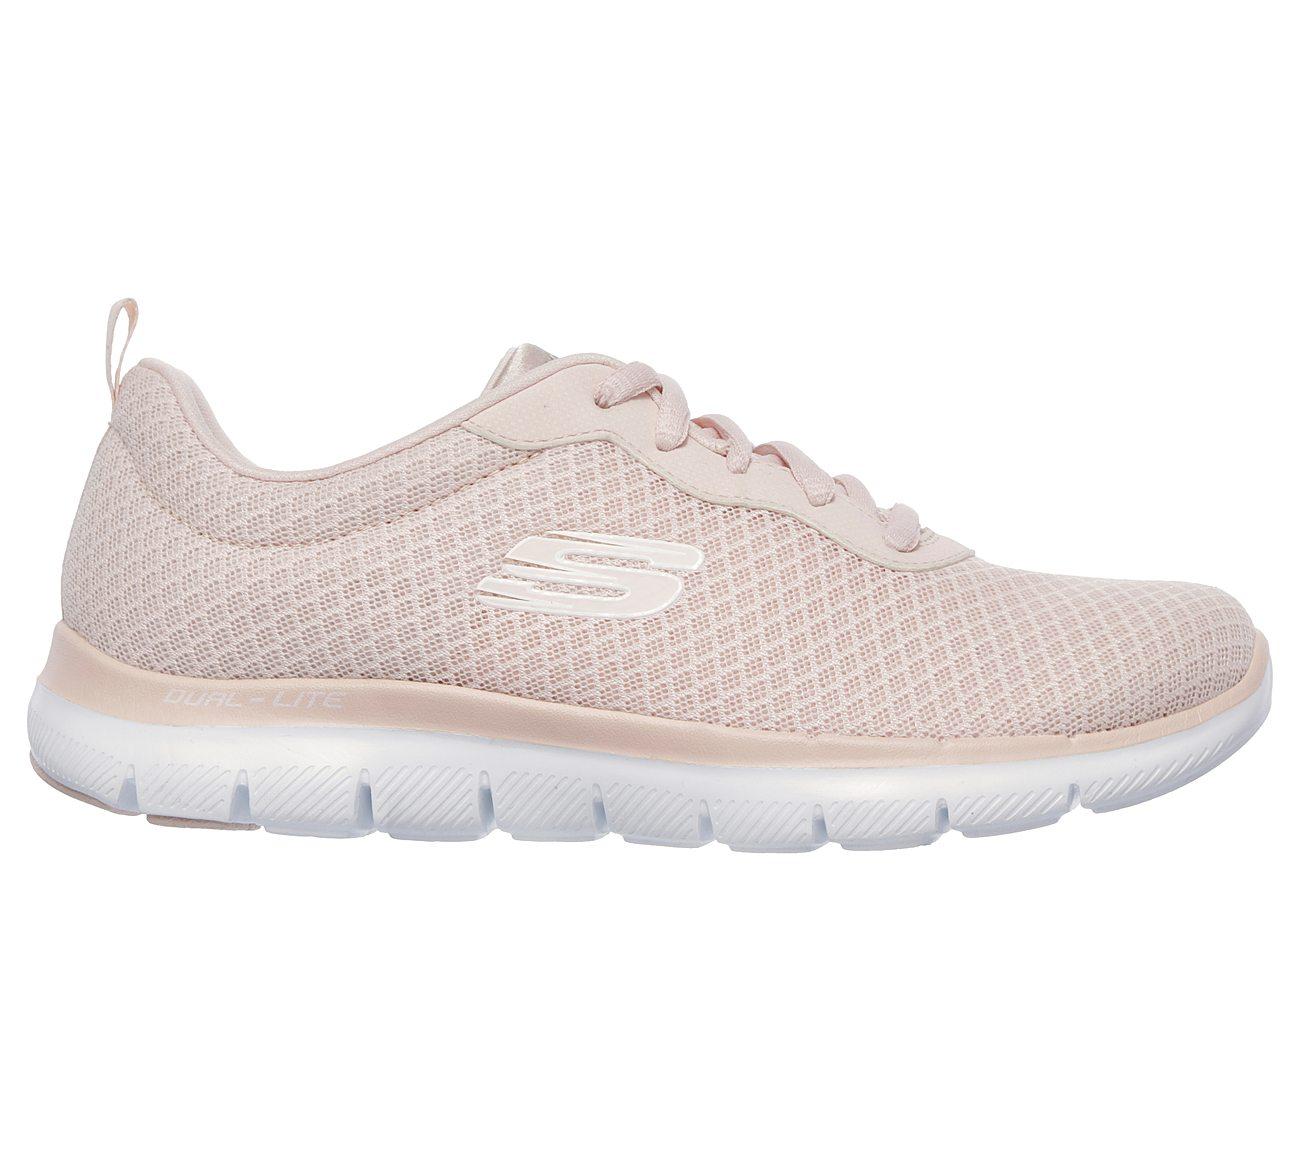 87d148adb59d Buy SKECHERS Flex Appeal 2.0 - Newsmaker Flex Appeal Shoes only  55.00